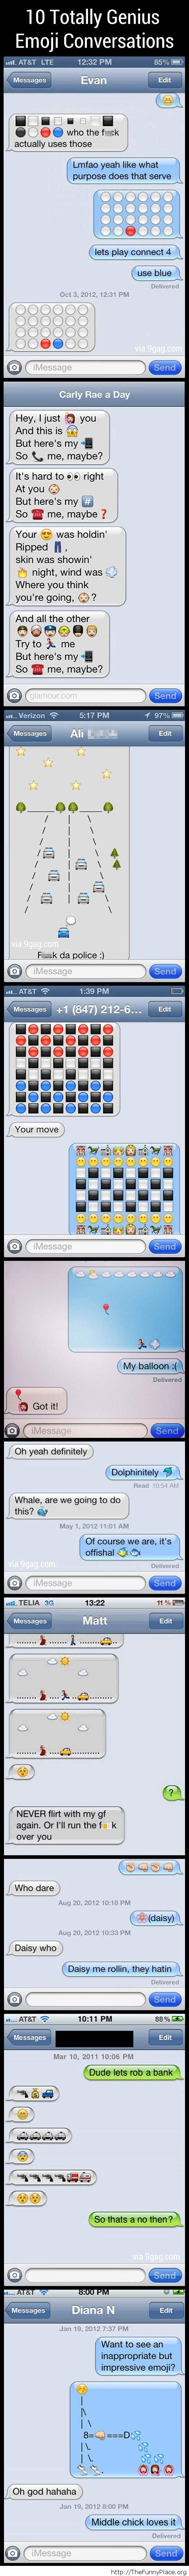 Emoji moticons story